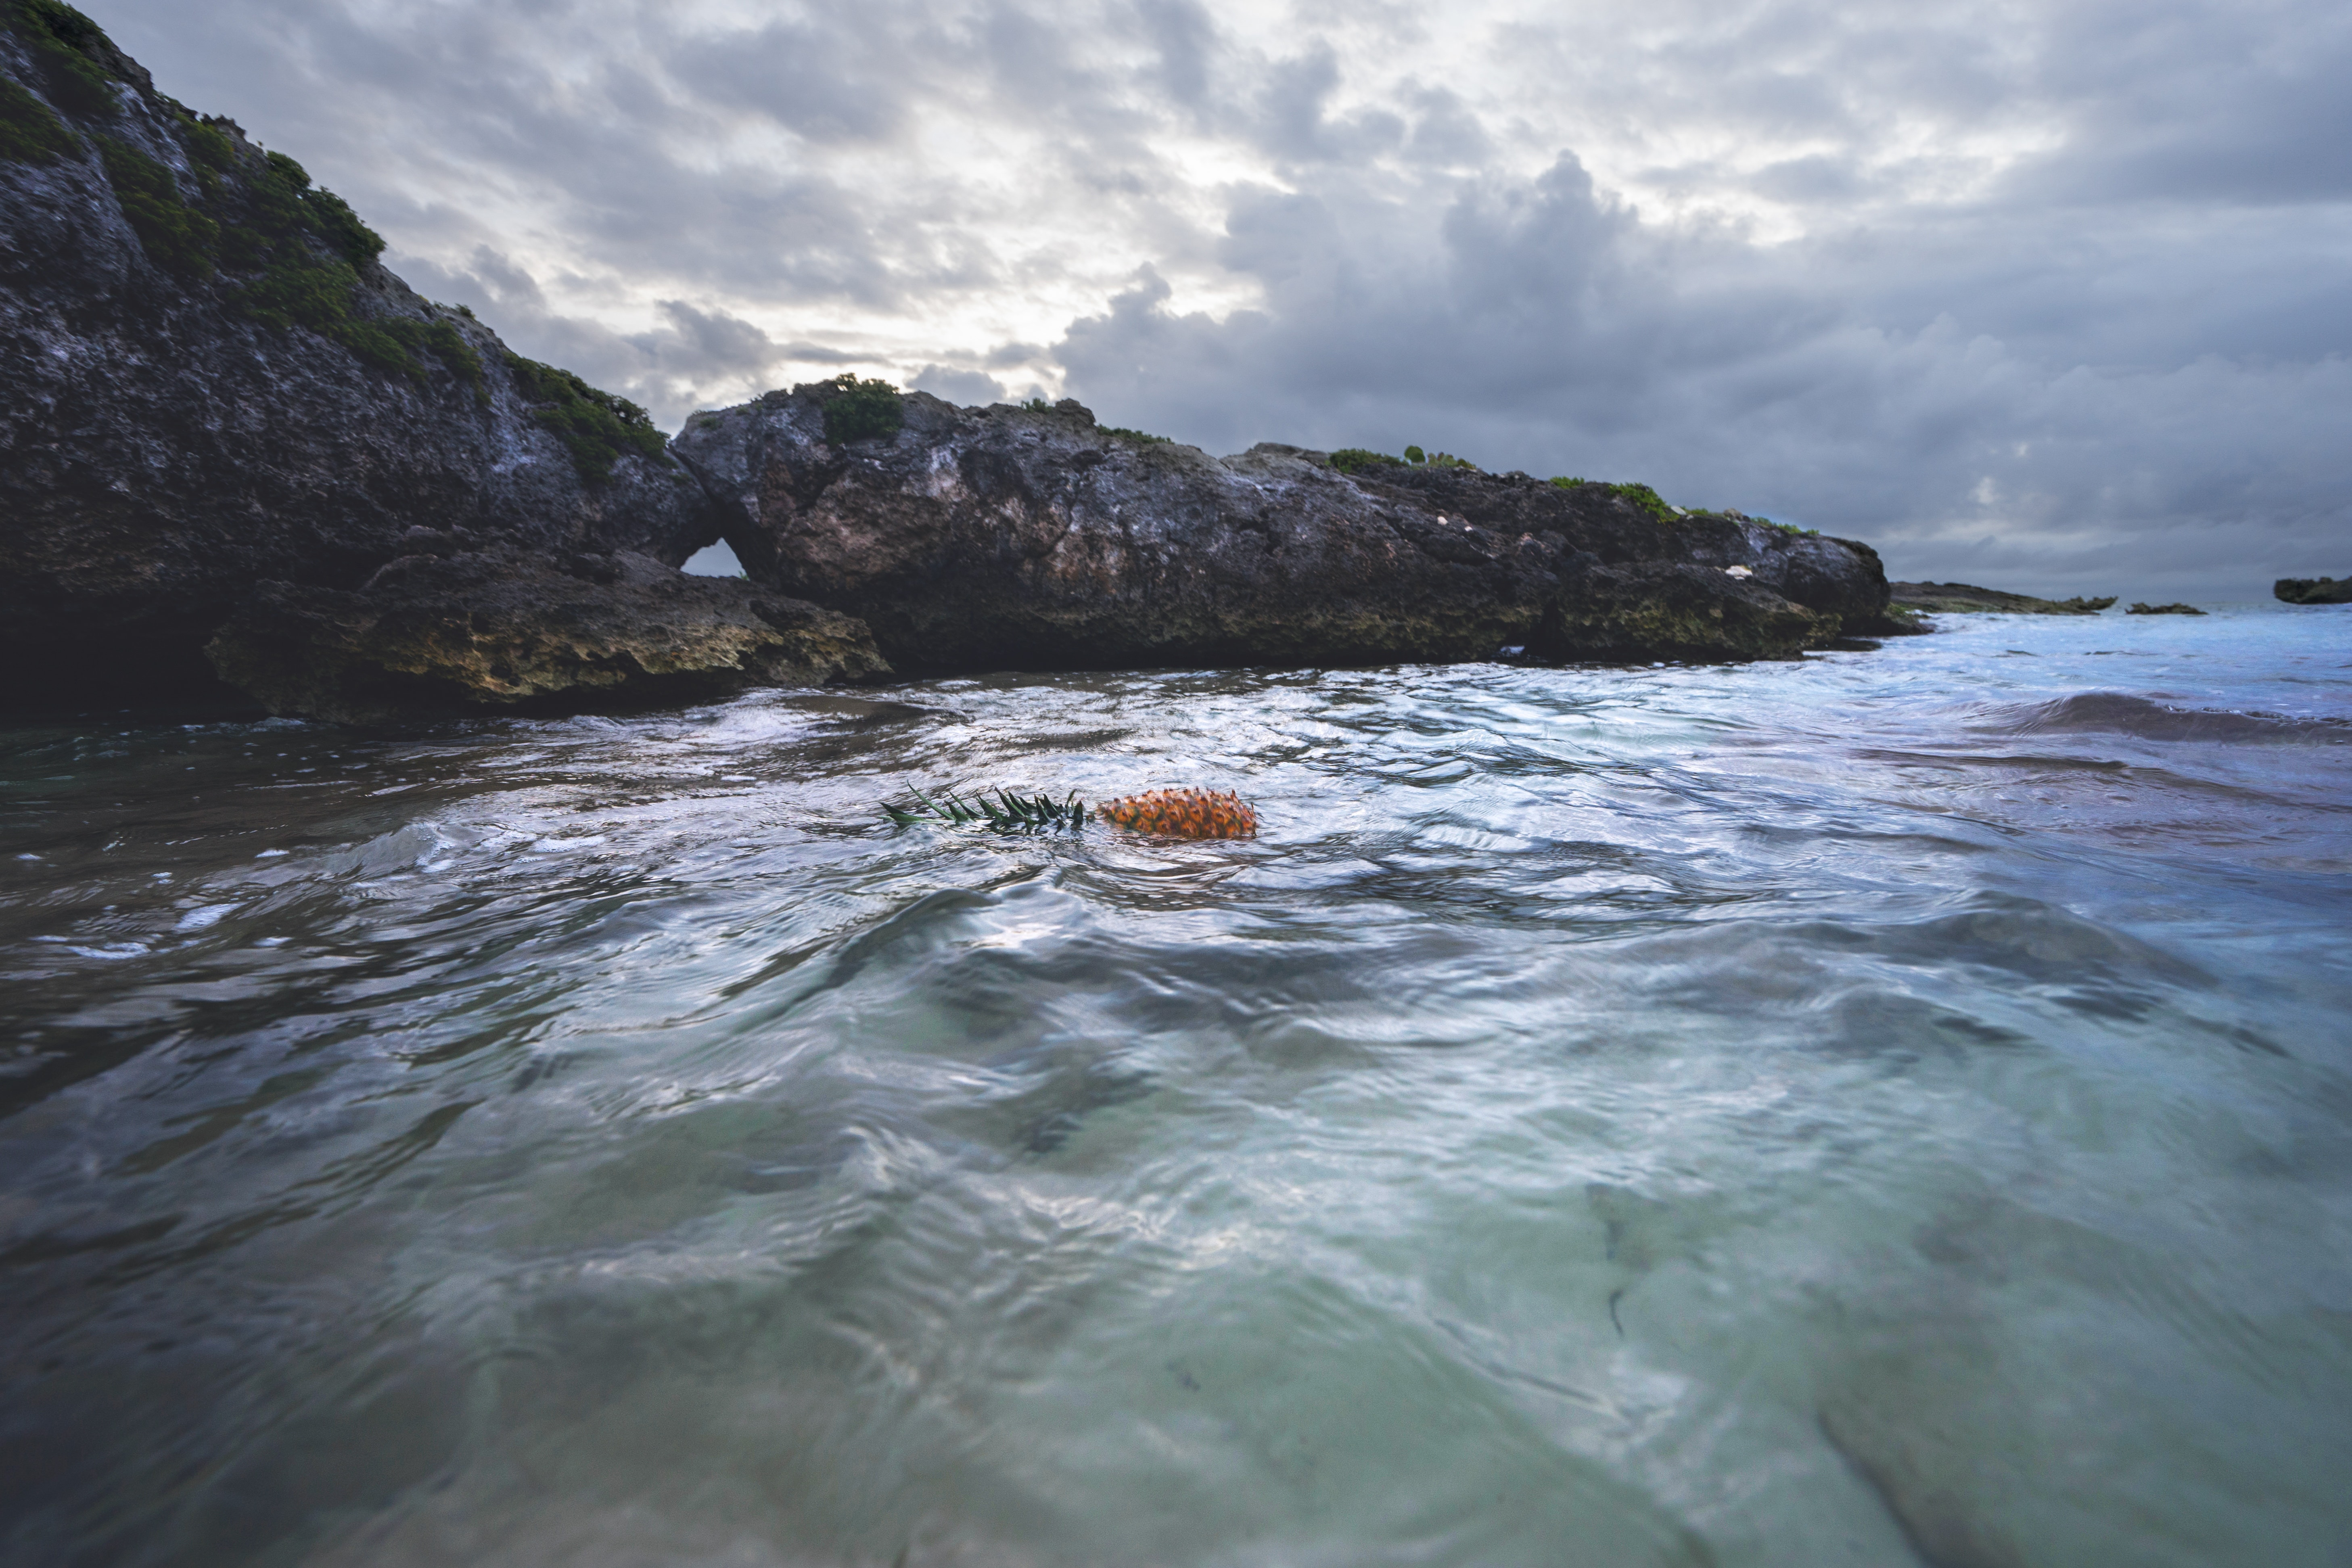 Rocky cliff near calm sea under gray cloudy sky photo